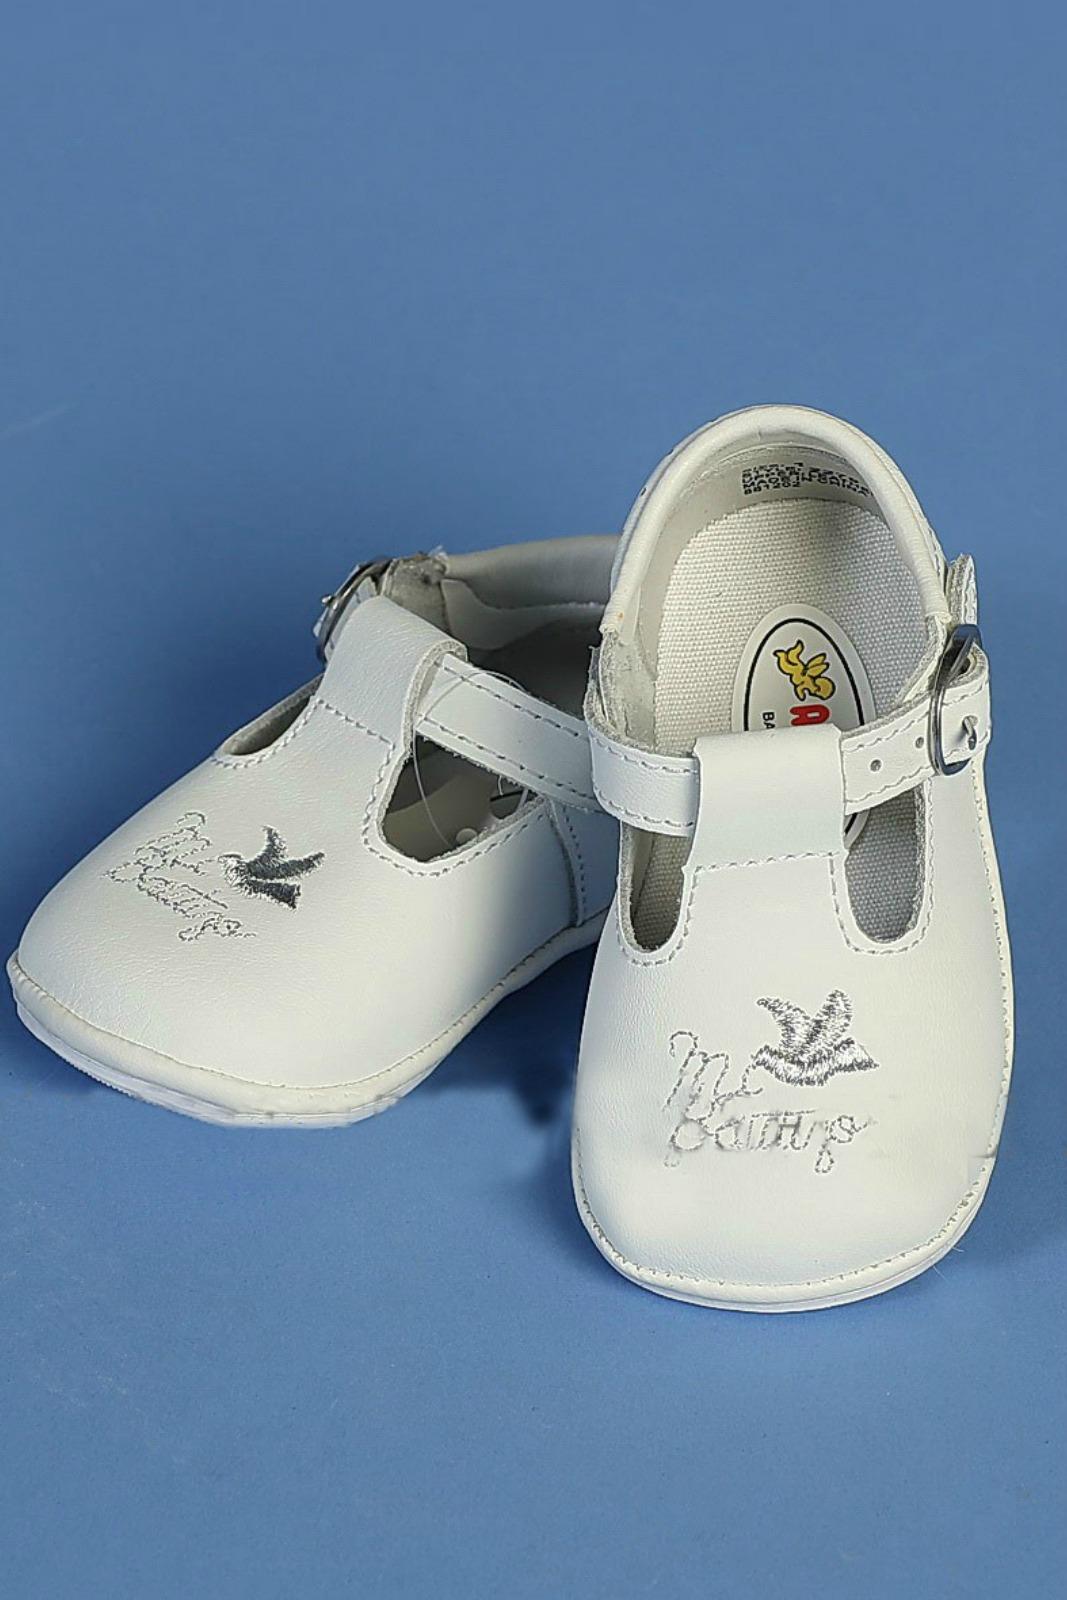 Girls christening shoes flower girl dresses flower girl dress girls shoe style sh2279 classic mi bautizo t strap shoes izmirmasajfo